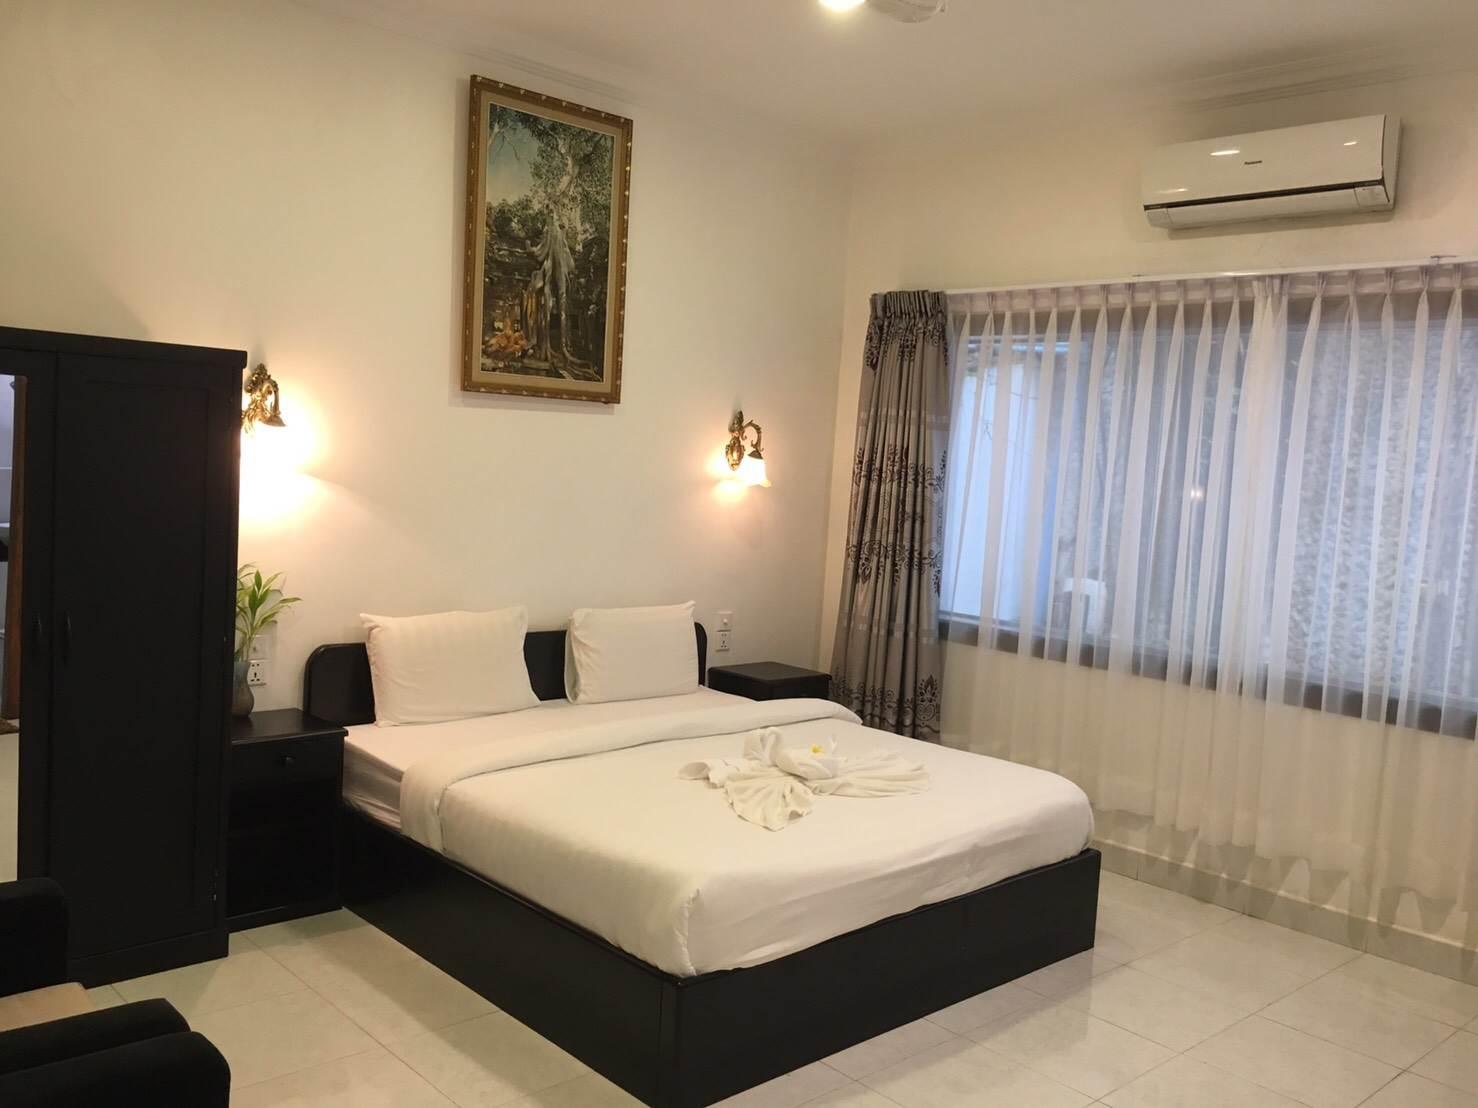 R23豪華標準房(1張雙人床)